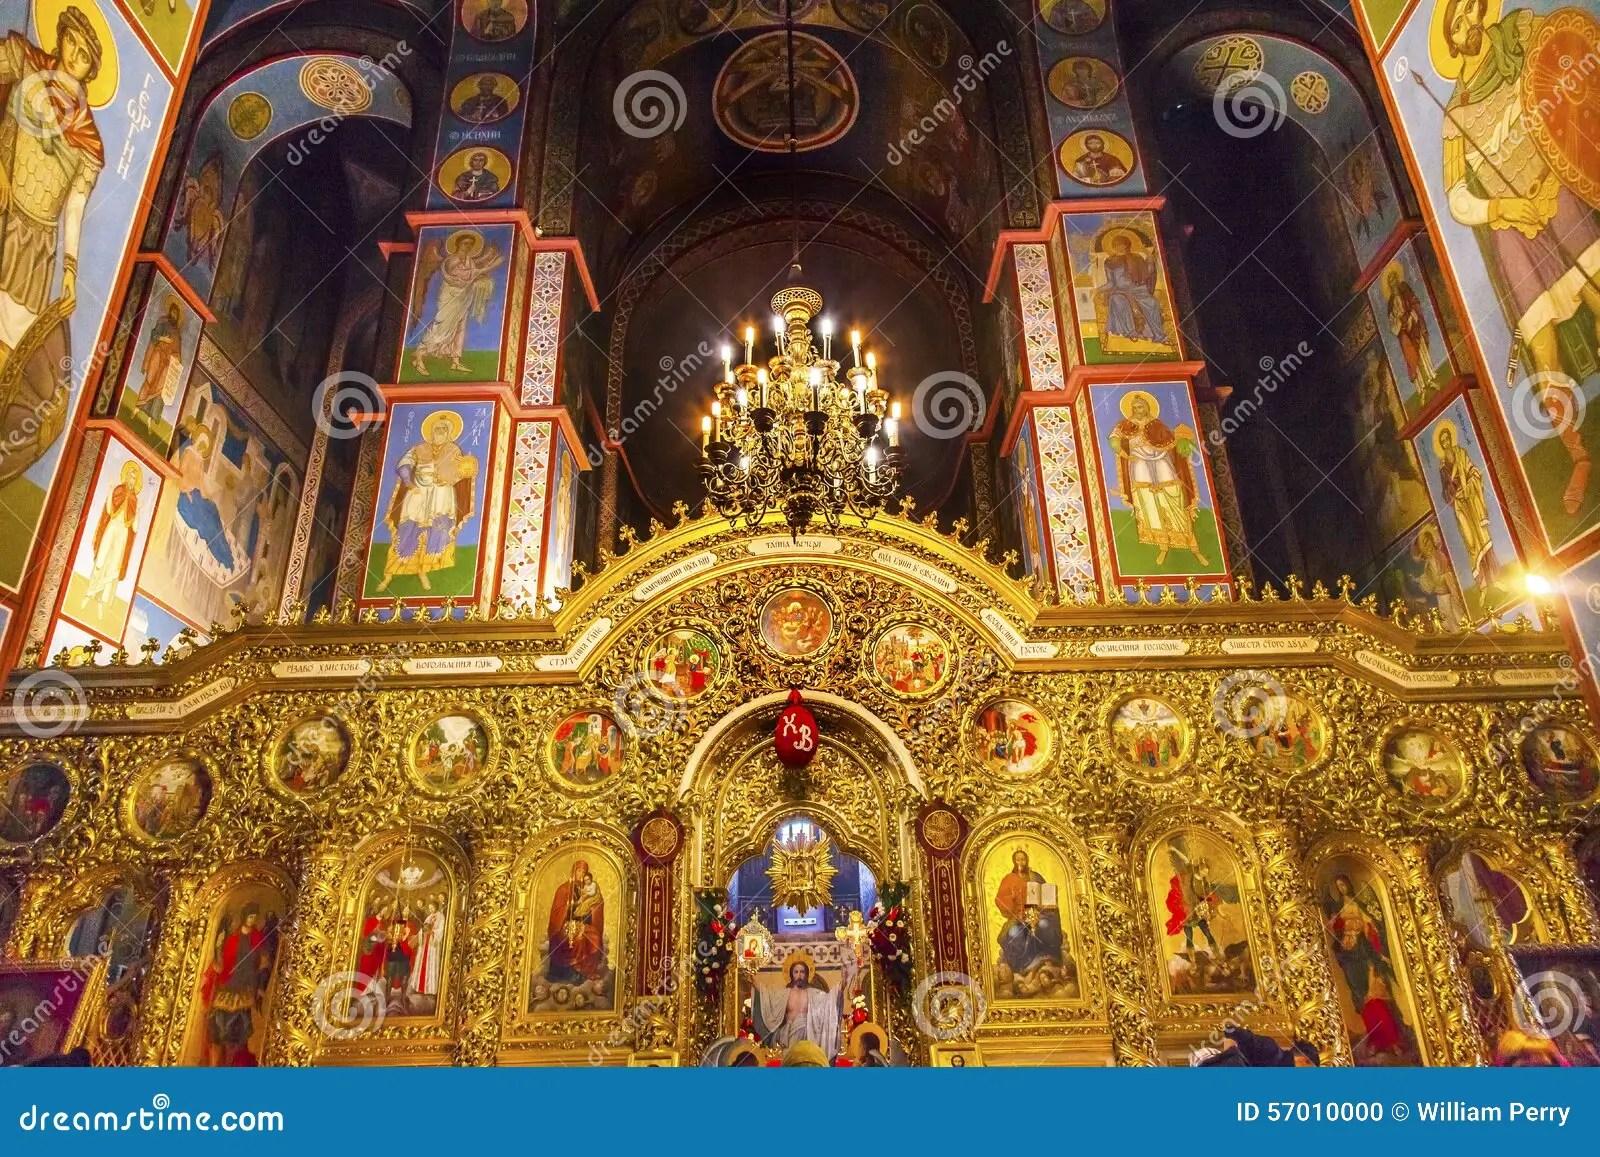 Cathedral Kiev Ukrainian